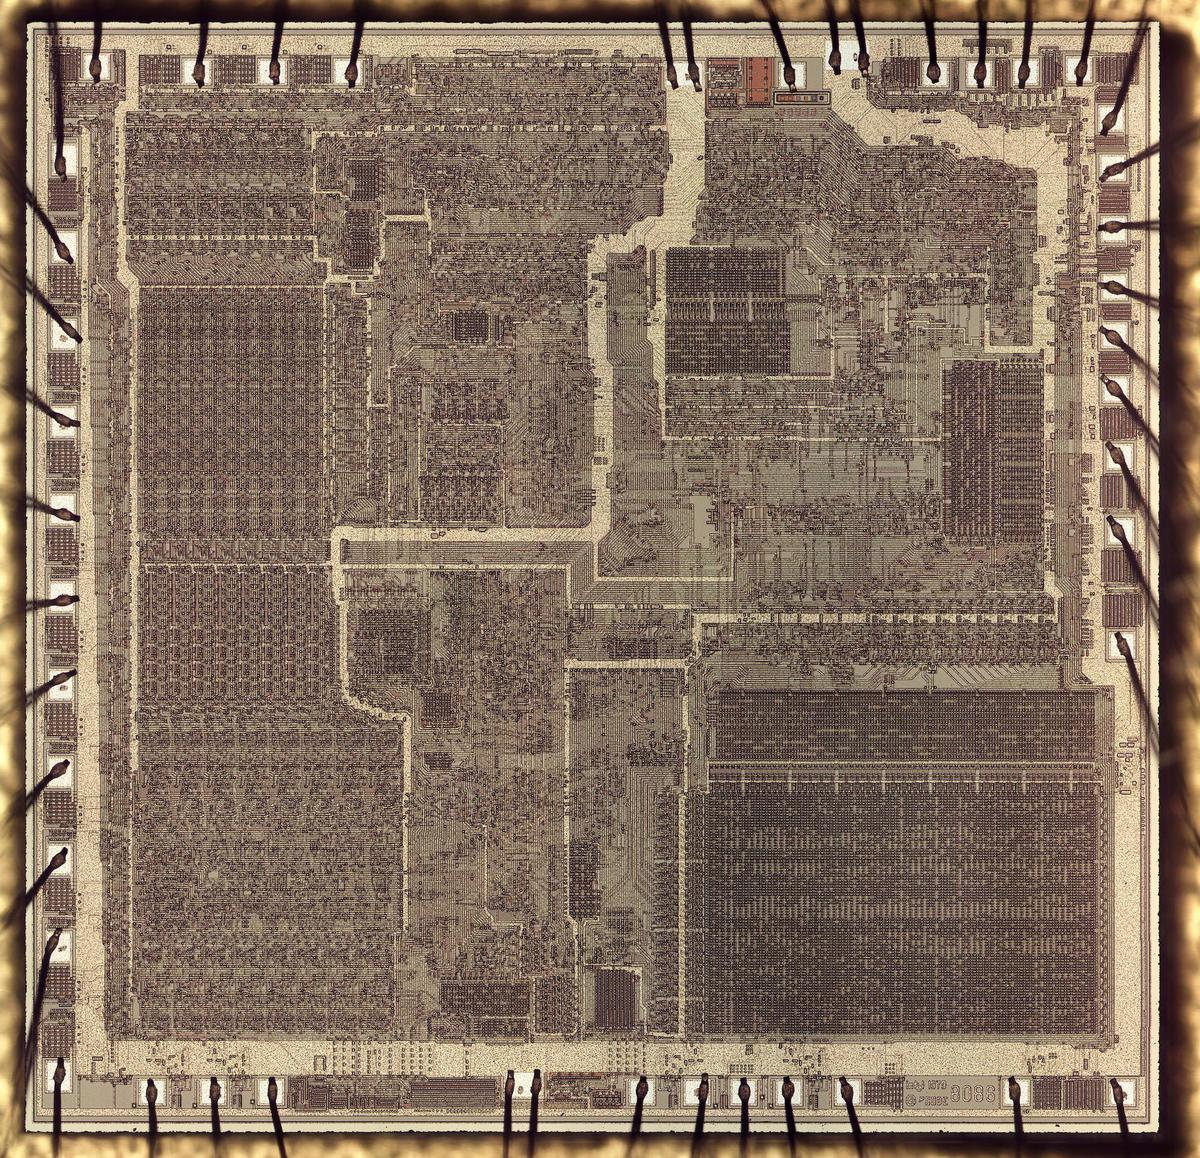 Die photo of a genuine 8086 chip.